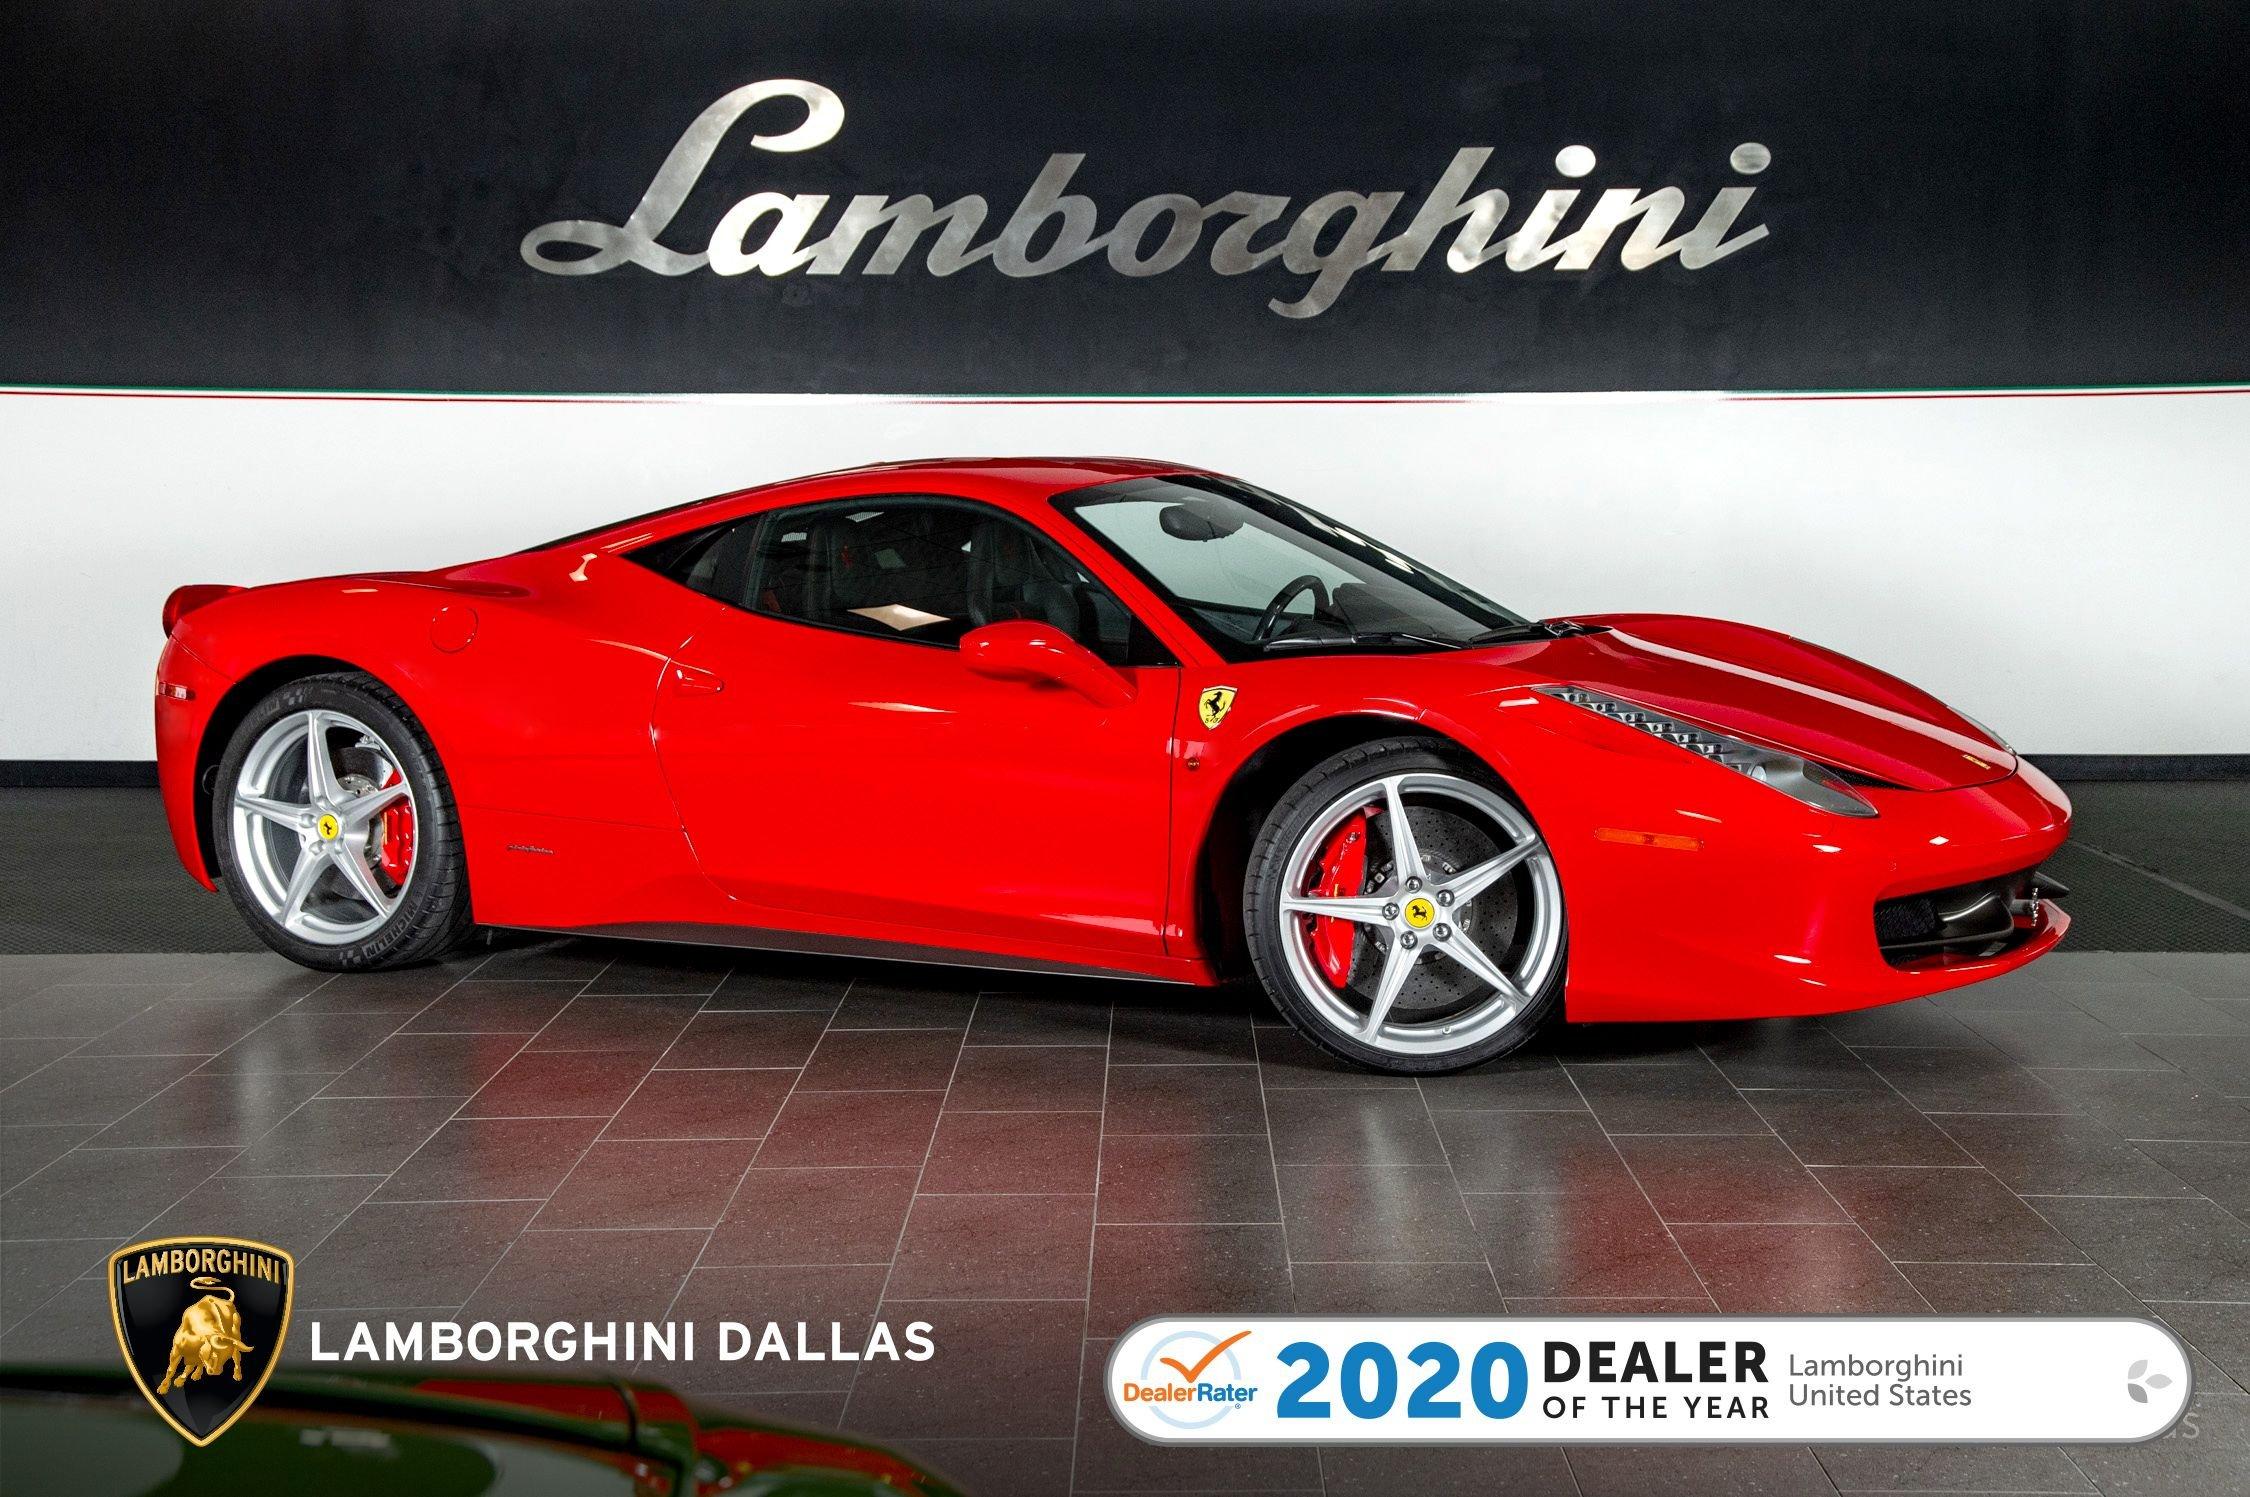 Used 2011 Ferrari 458 Italia For Sale Richardson Tx Stock Lc634 Vin Zff67nfa8b0177418